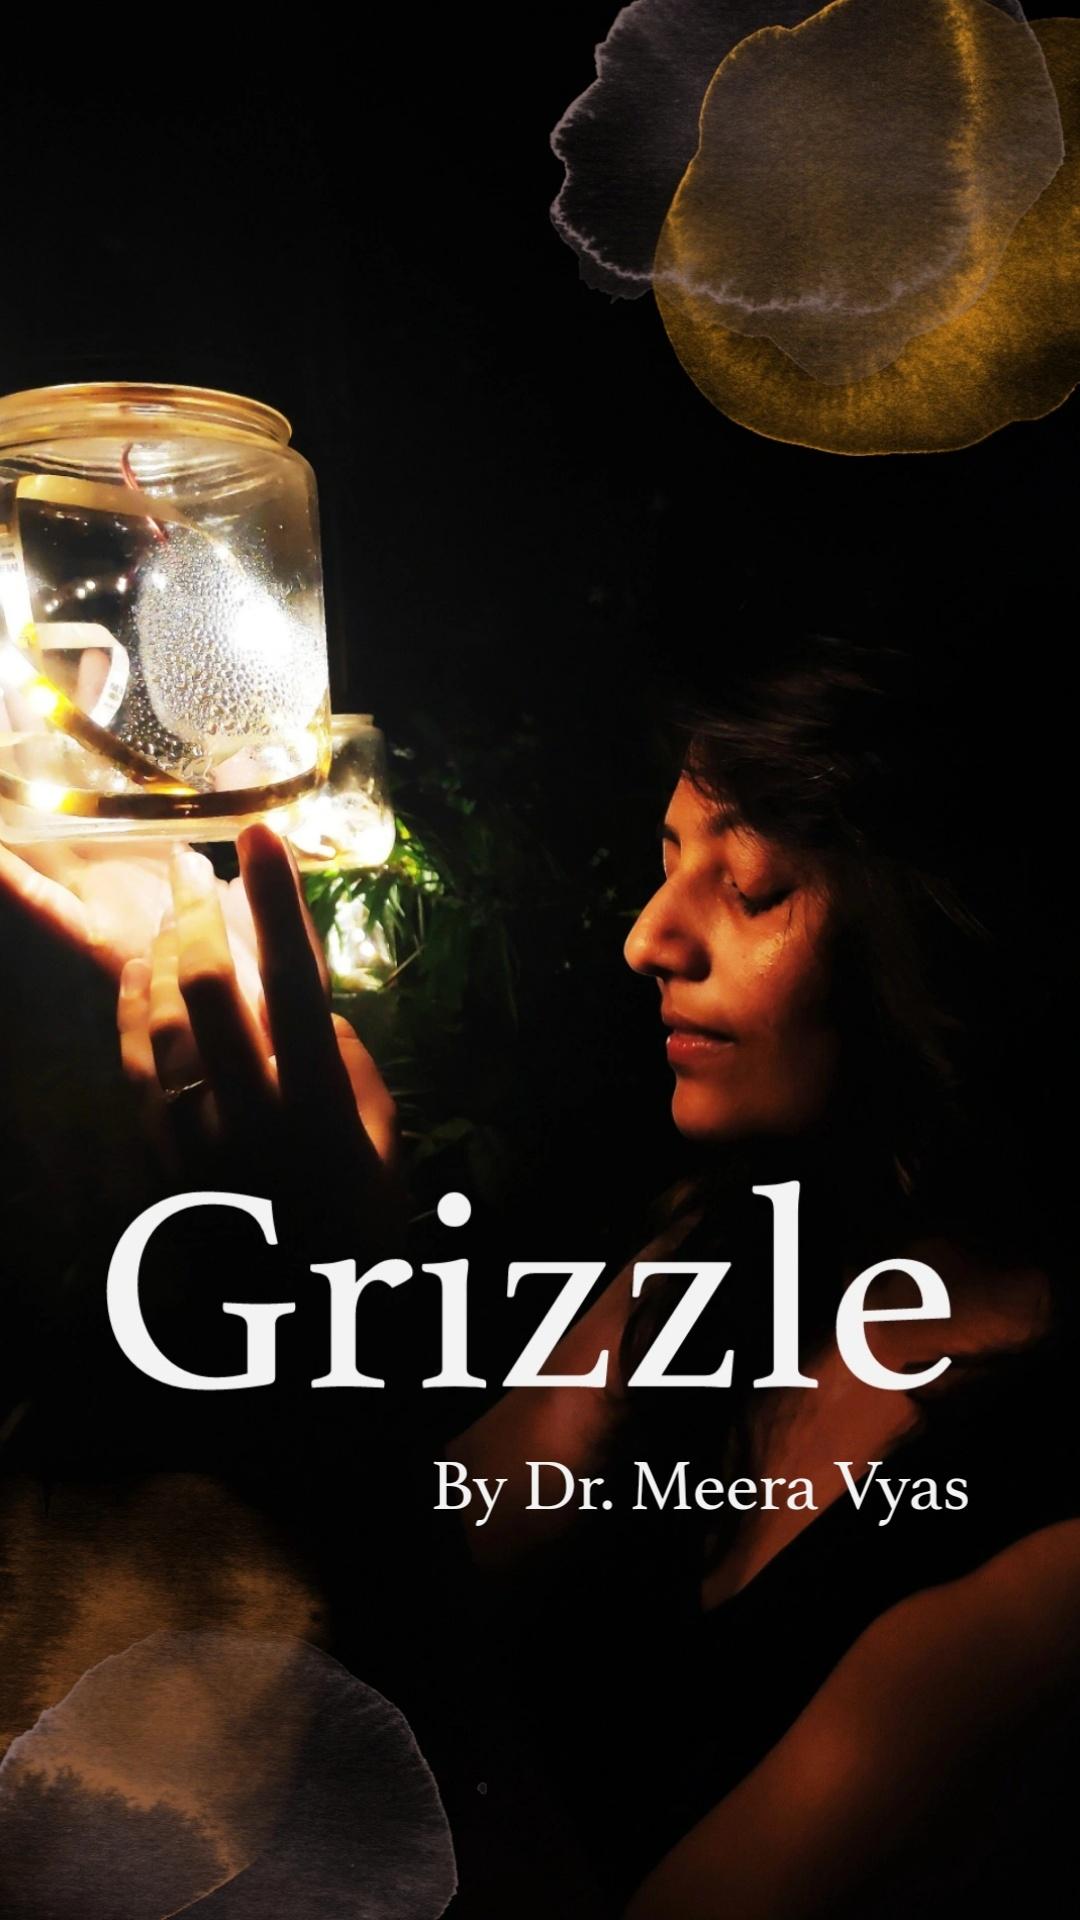 Grrizle